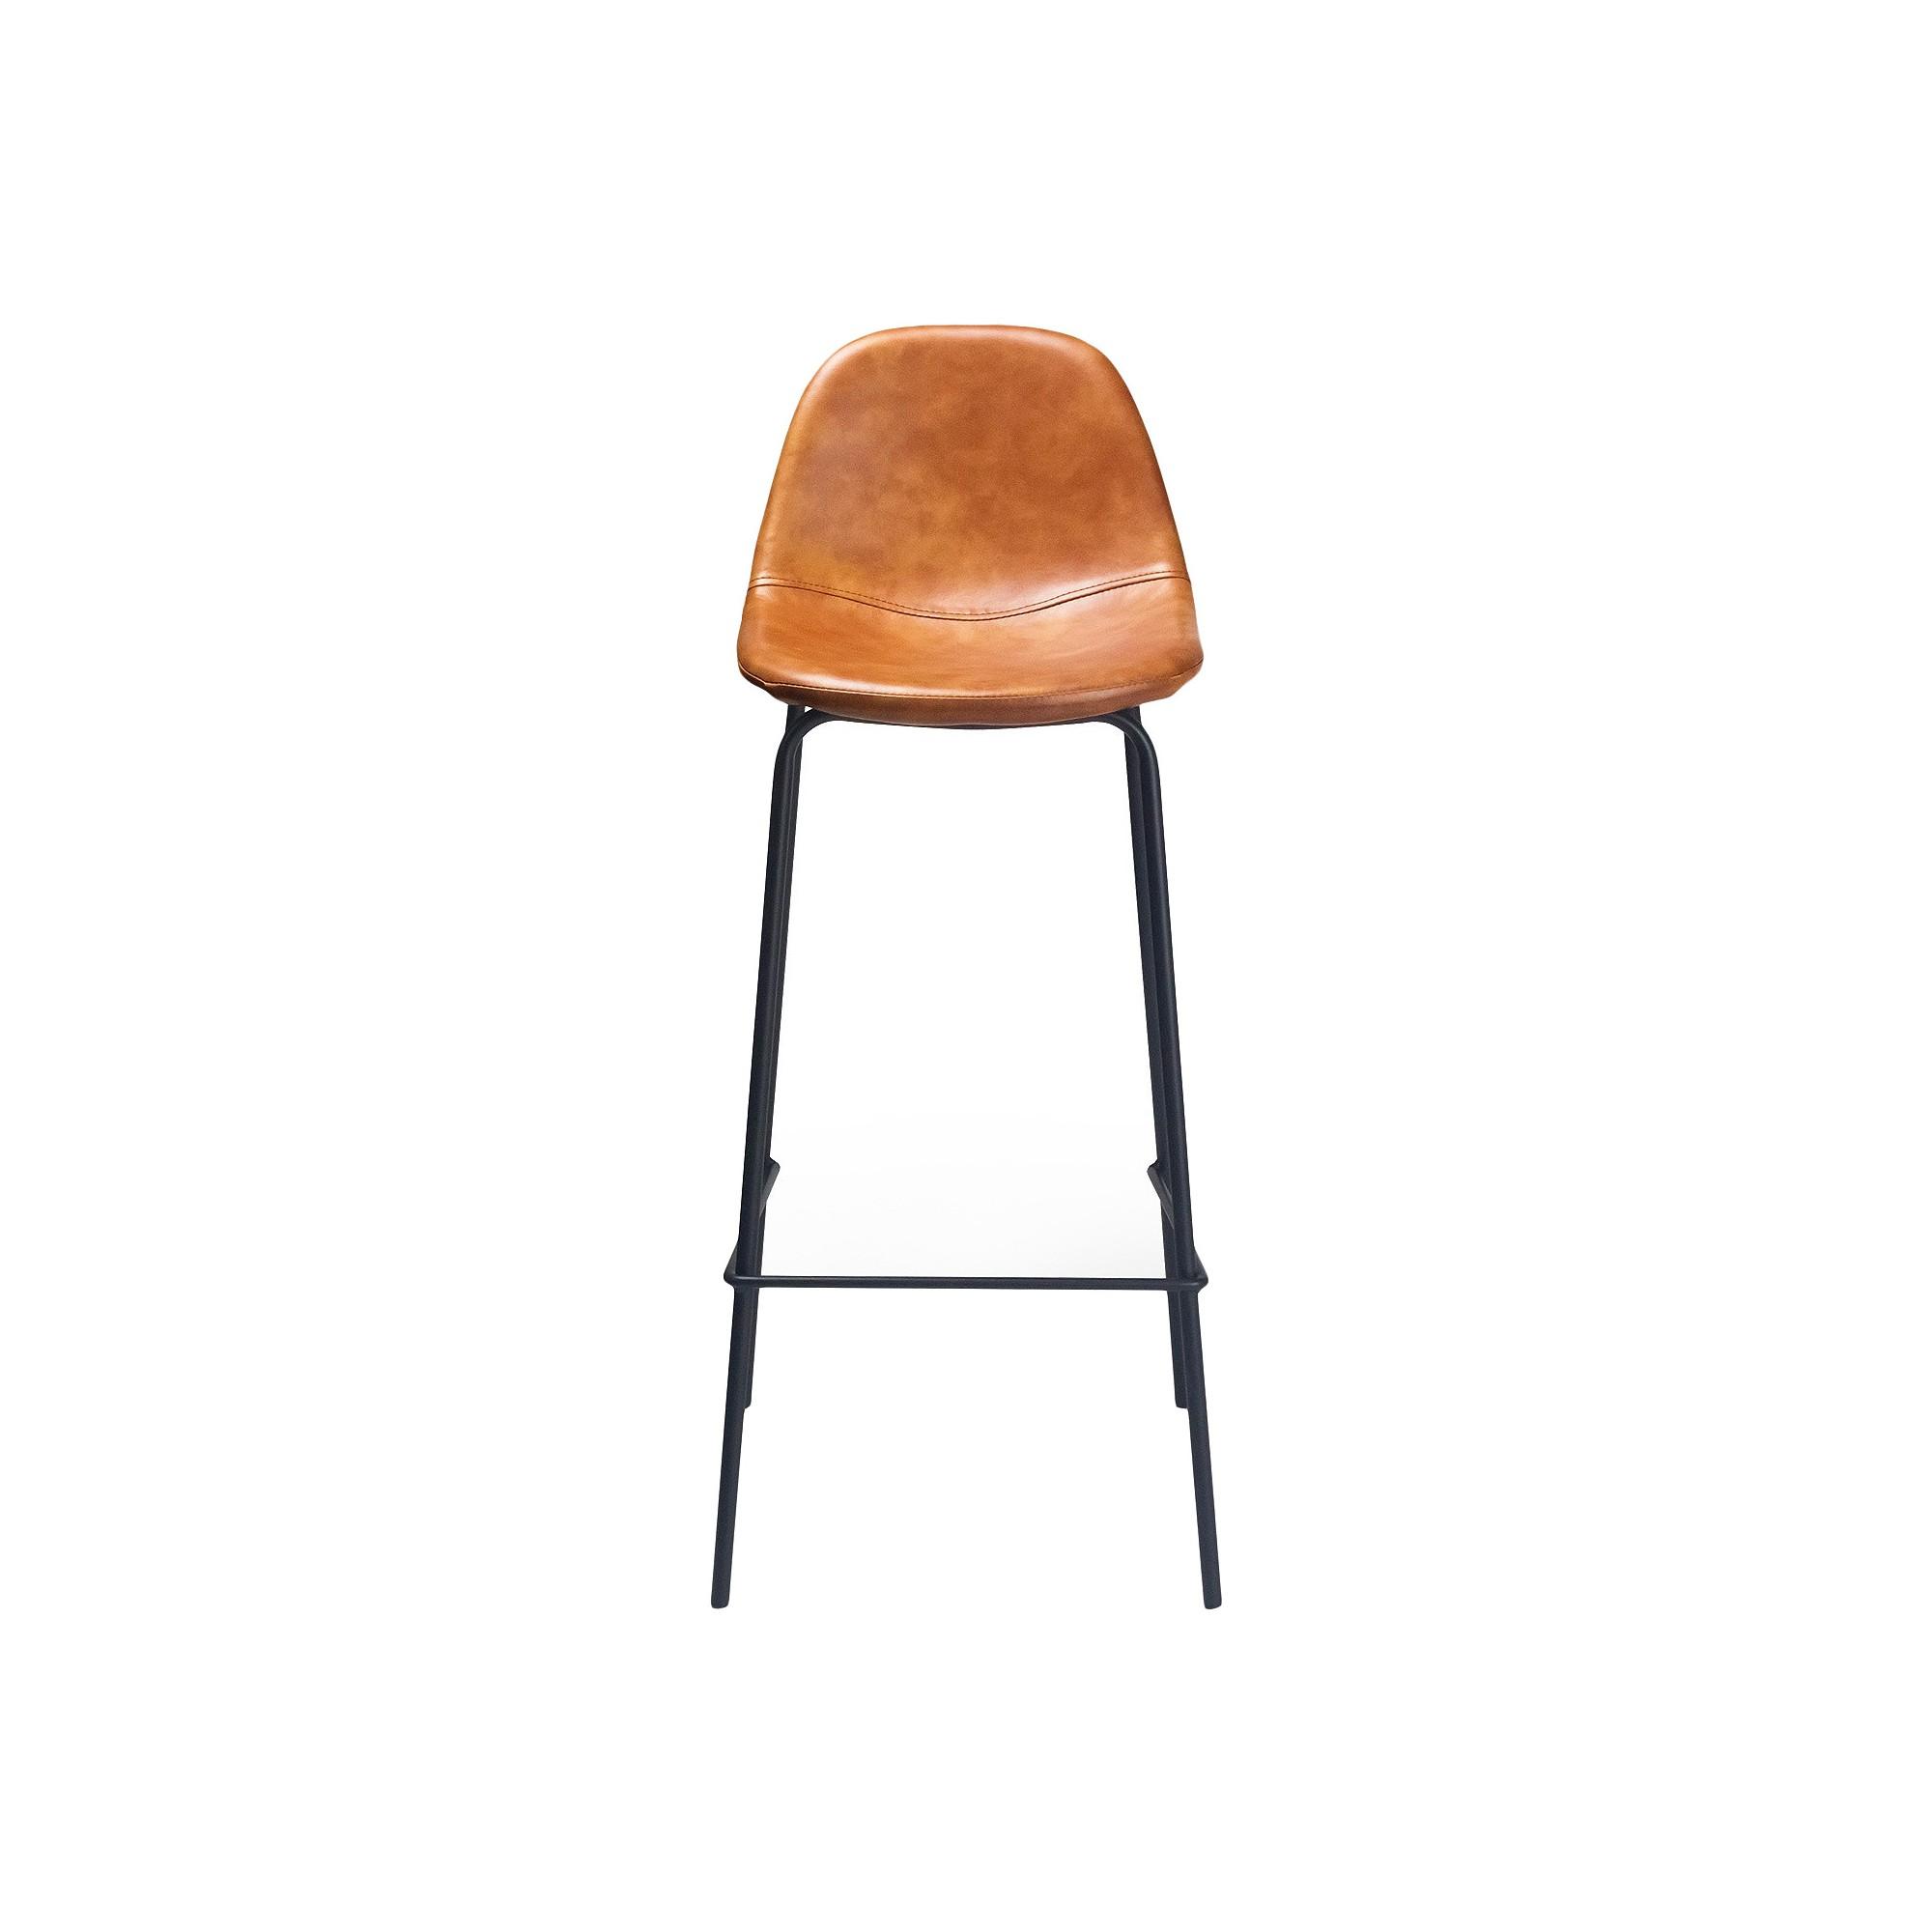 Maxine Modern Upholstered Faux Leather Barstool (Set of 2) - Honey - Aeon